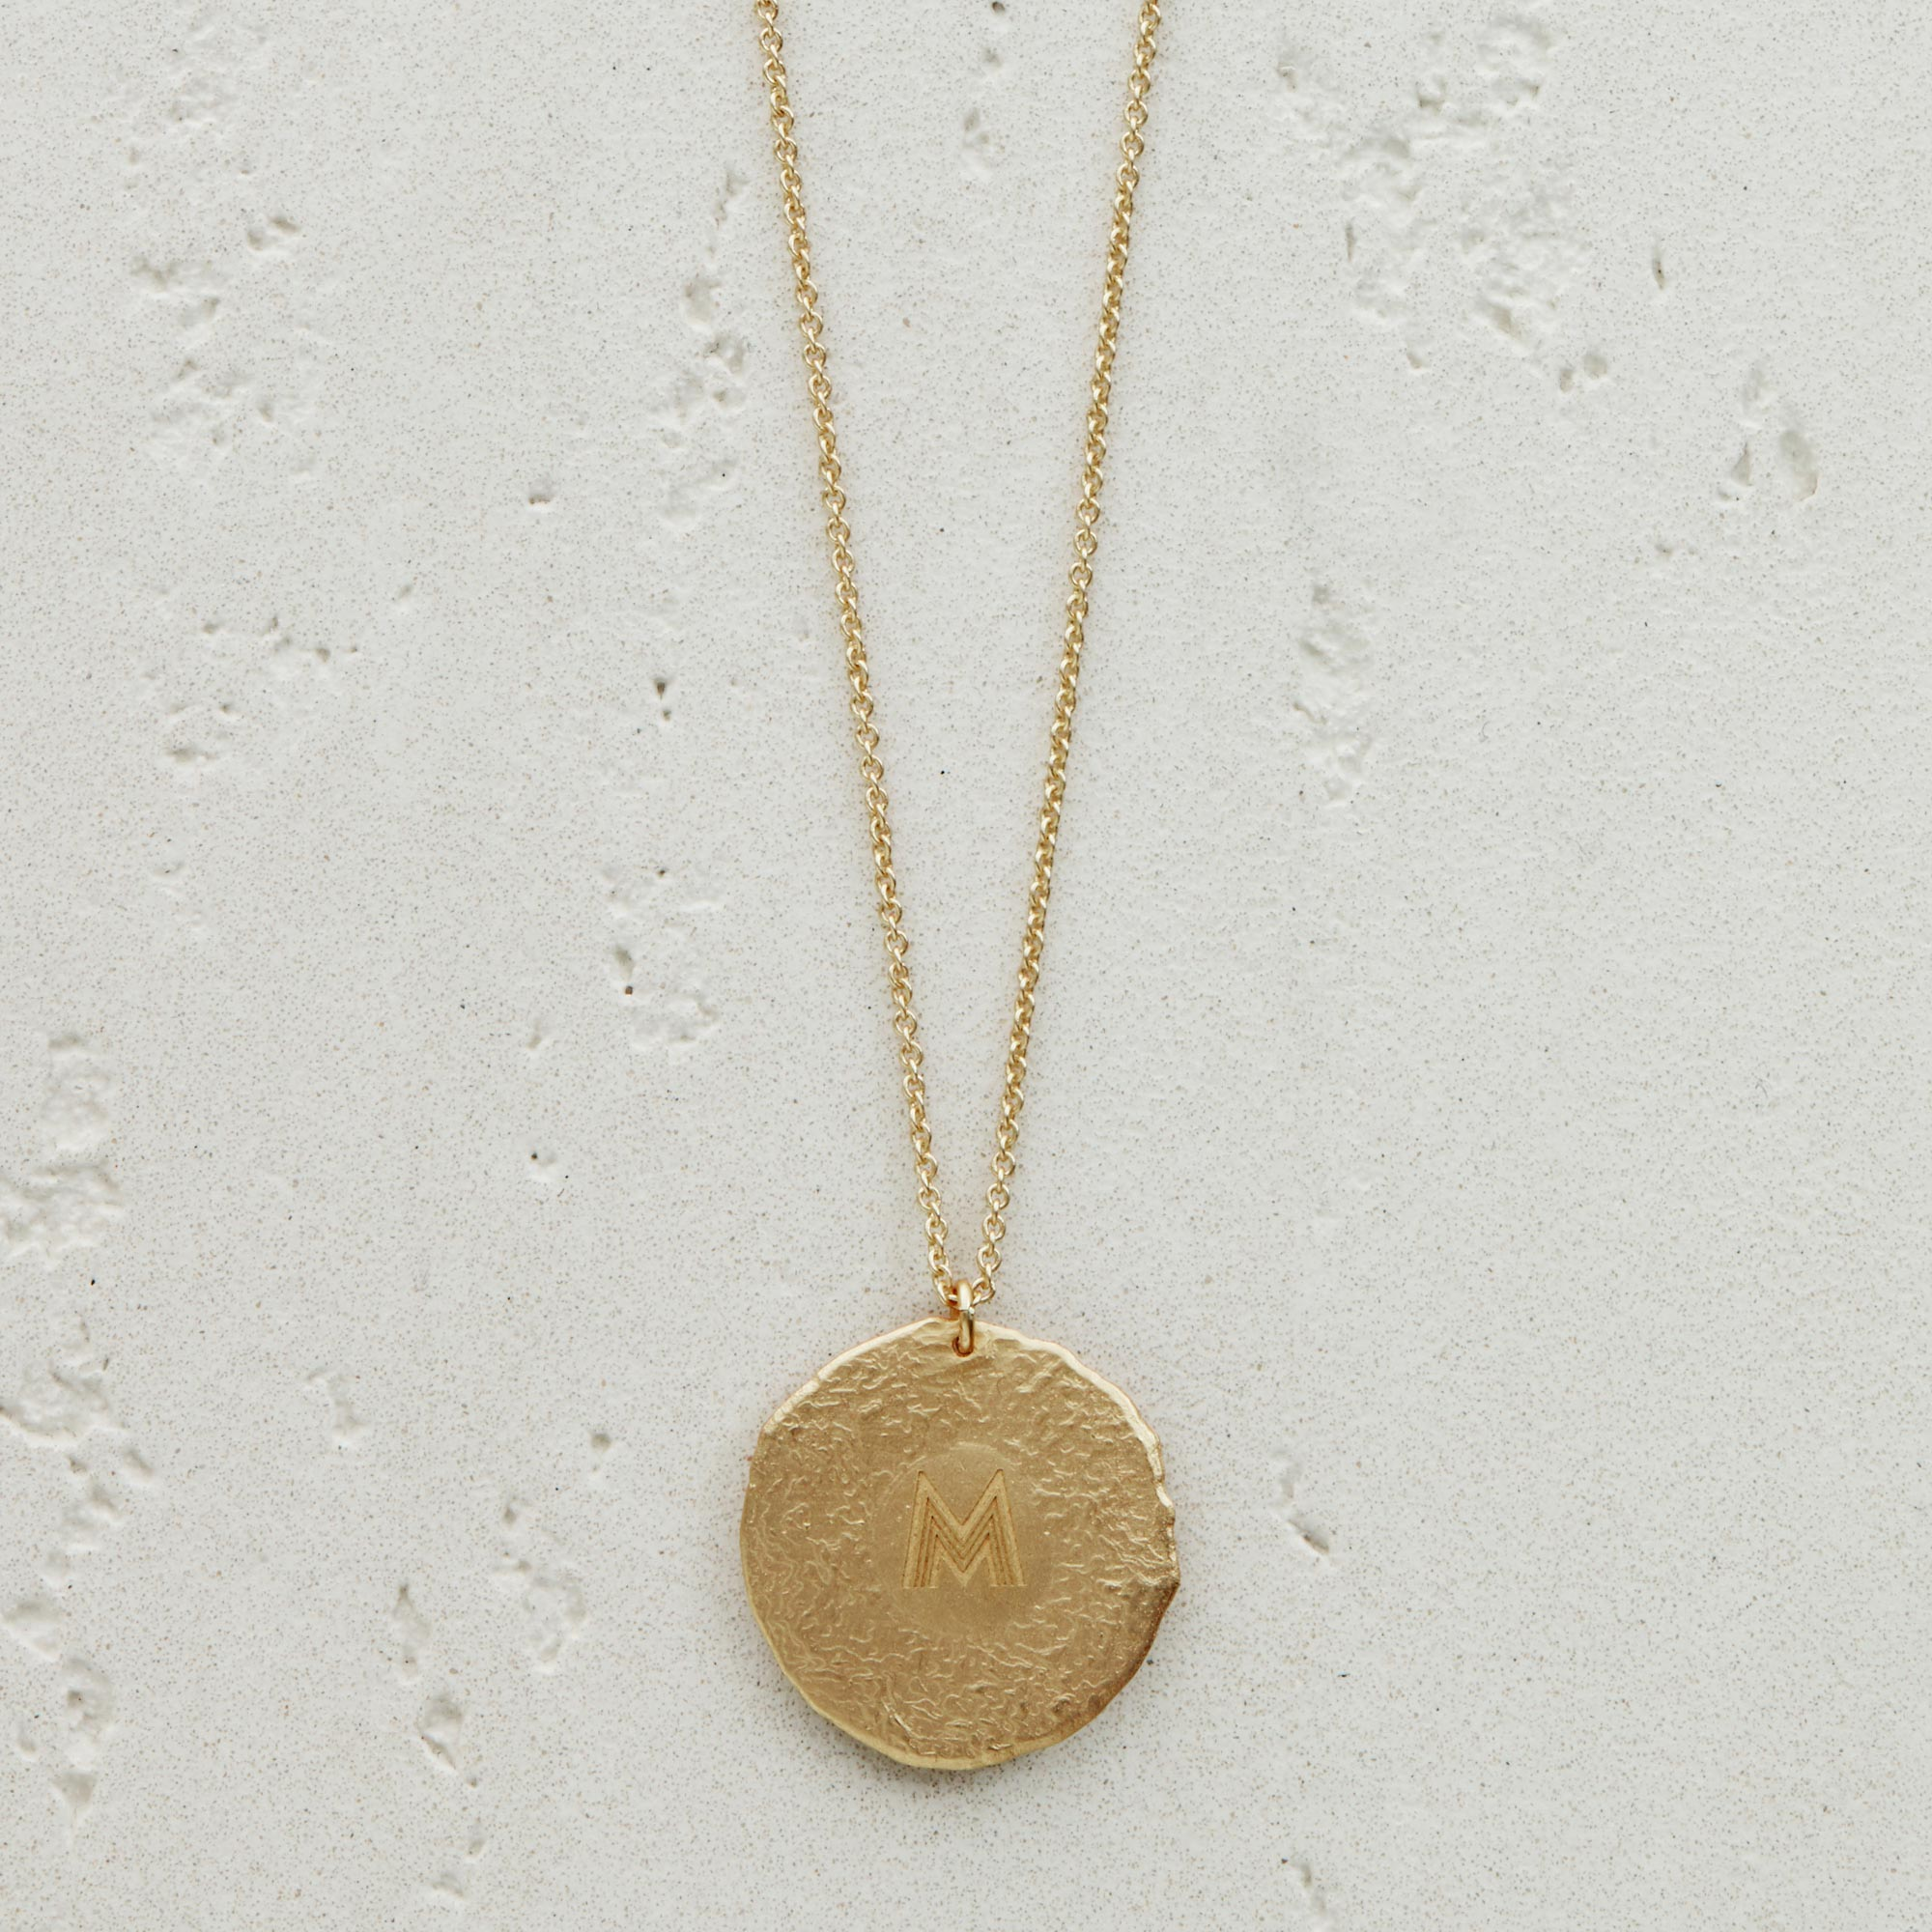 Gemini Astro necklace - Gold